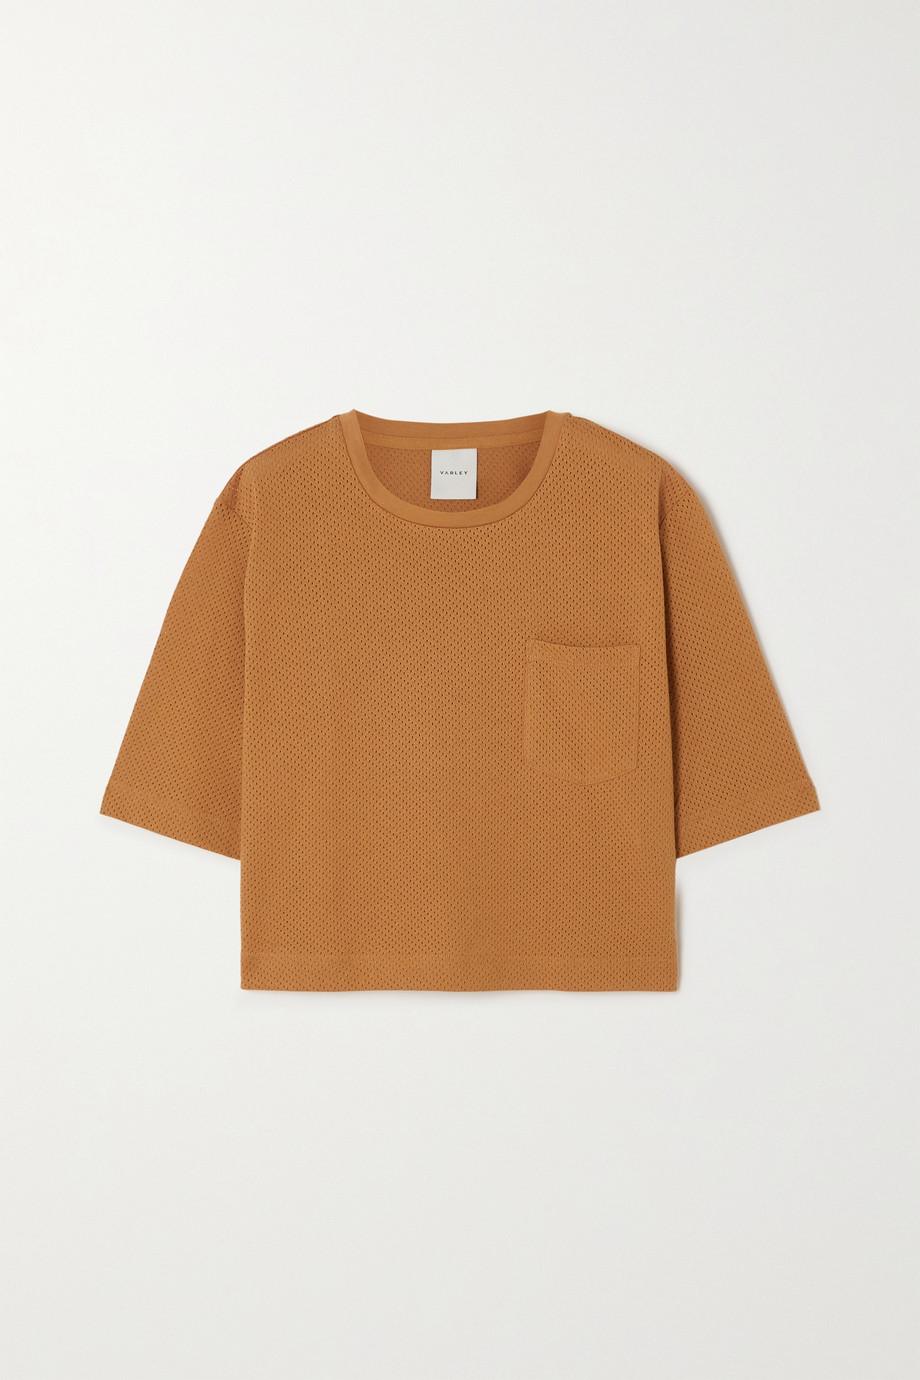 Varley Bexley verkürztes, perforiertes T-Shirt aus Baumwoll-Jersey